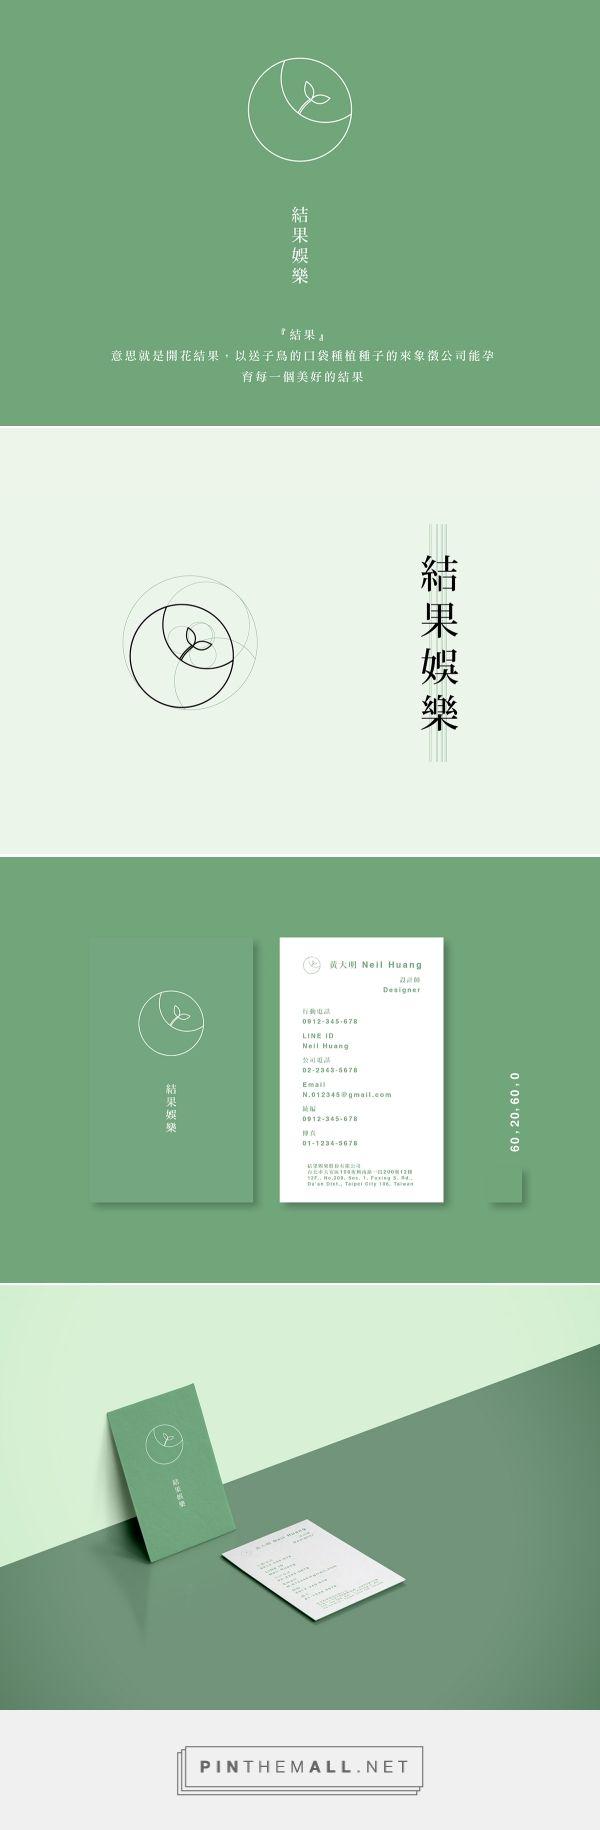 ChiehKuoYuLe  Logo & Business Card   結果娛樂形象與名片設計 on Behance - created via https://pinthemall.net